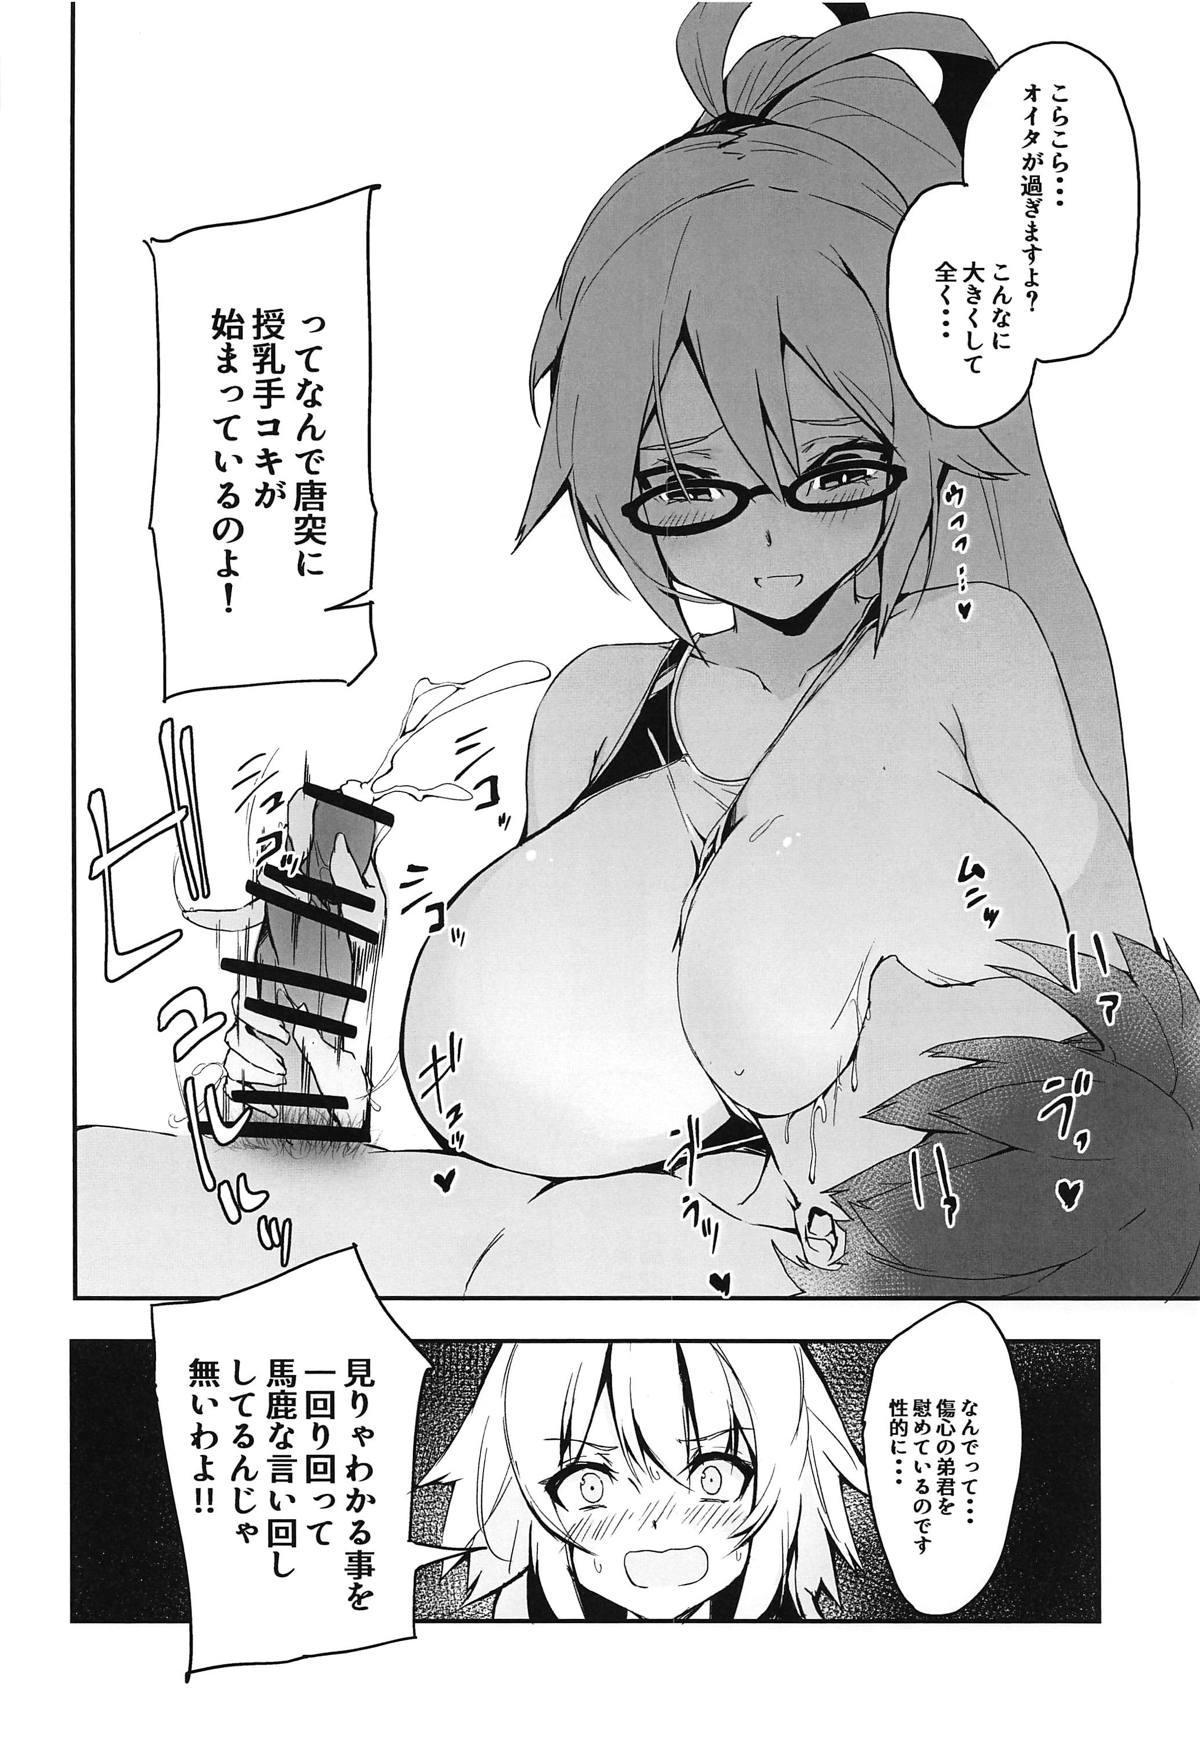 Double Jeanne to Shiawase 3P Luluhawa Seikatsu 14